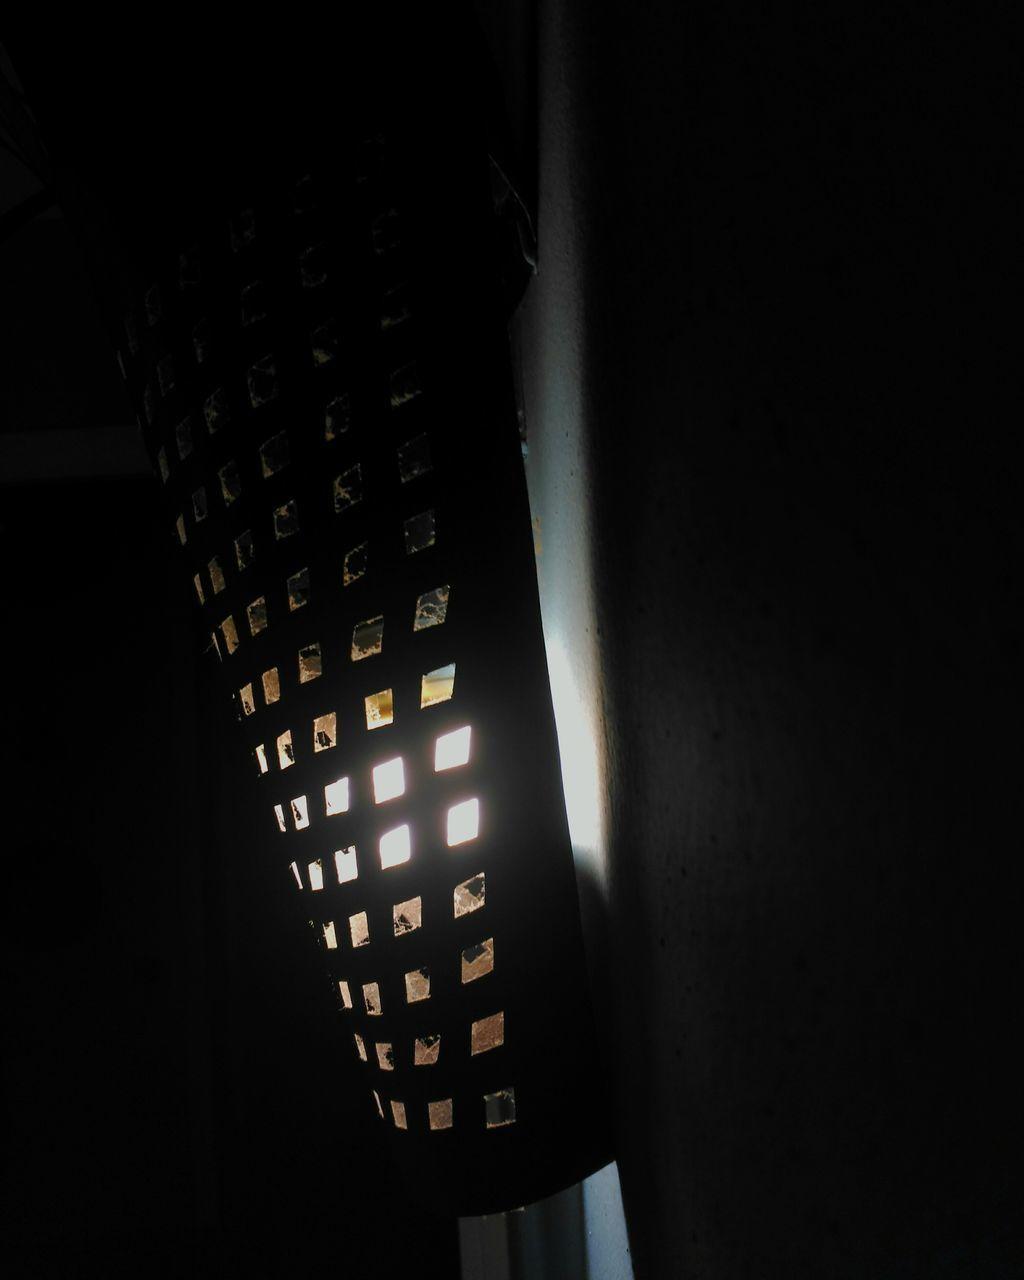 indoors, no people, illuminated, electricity, technology, close-up, night